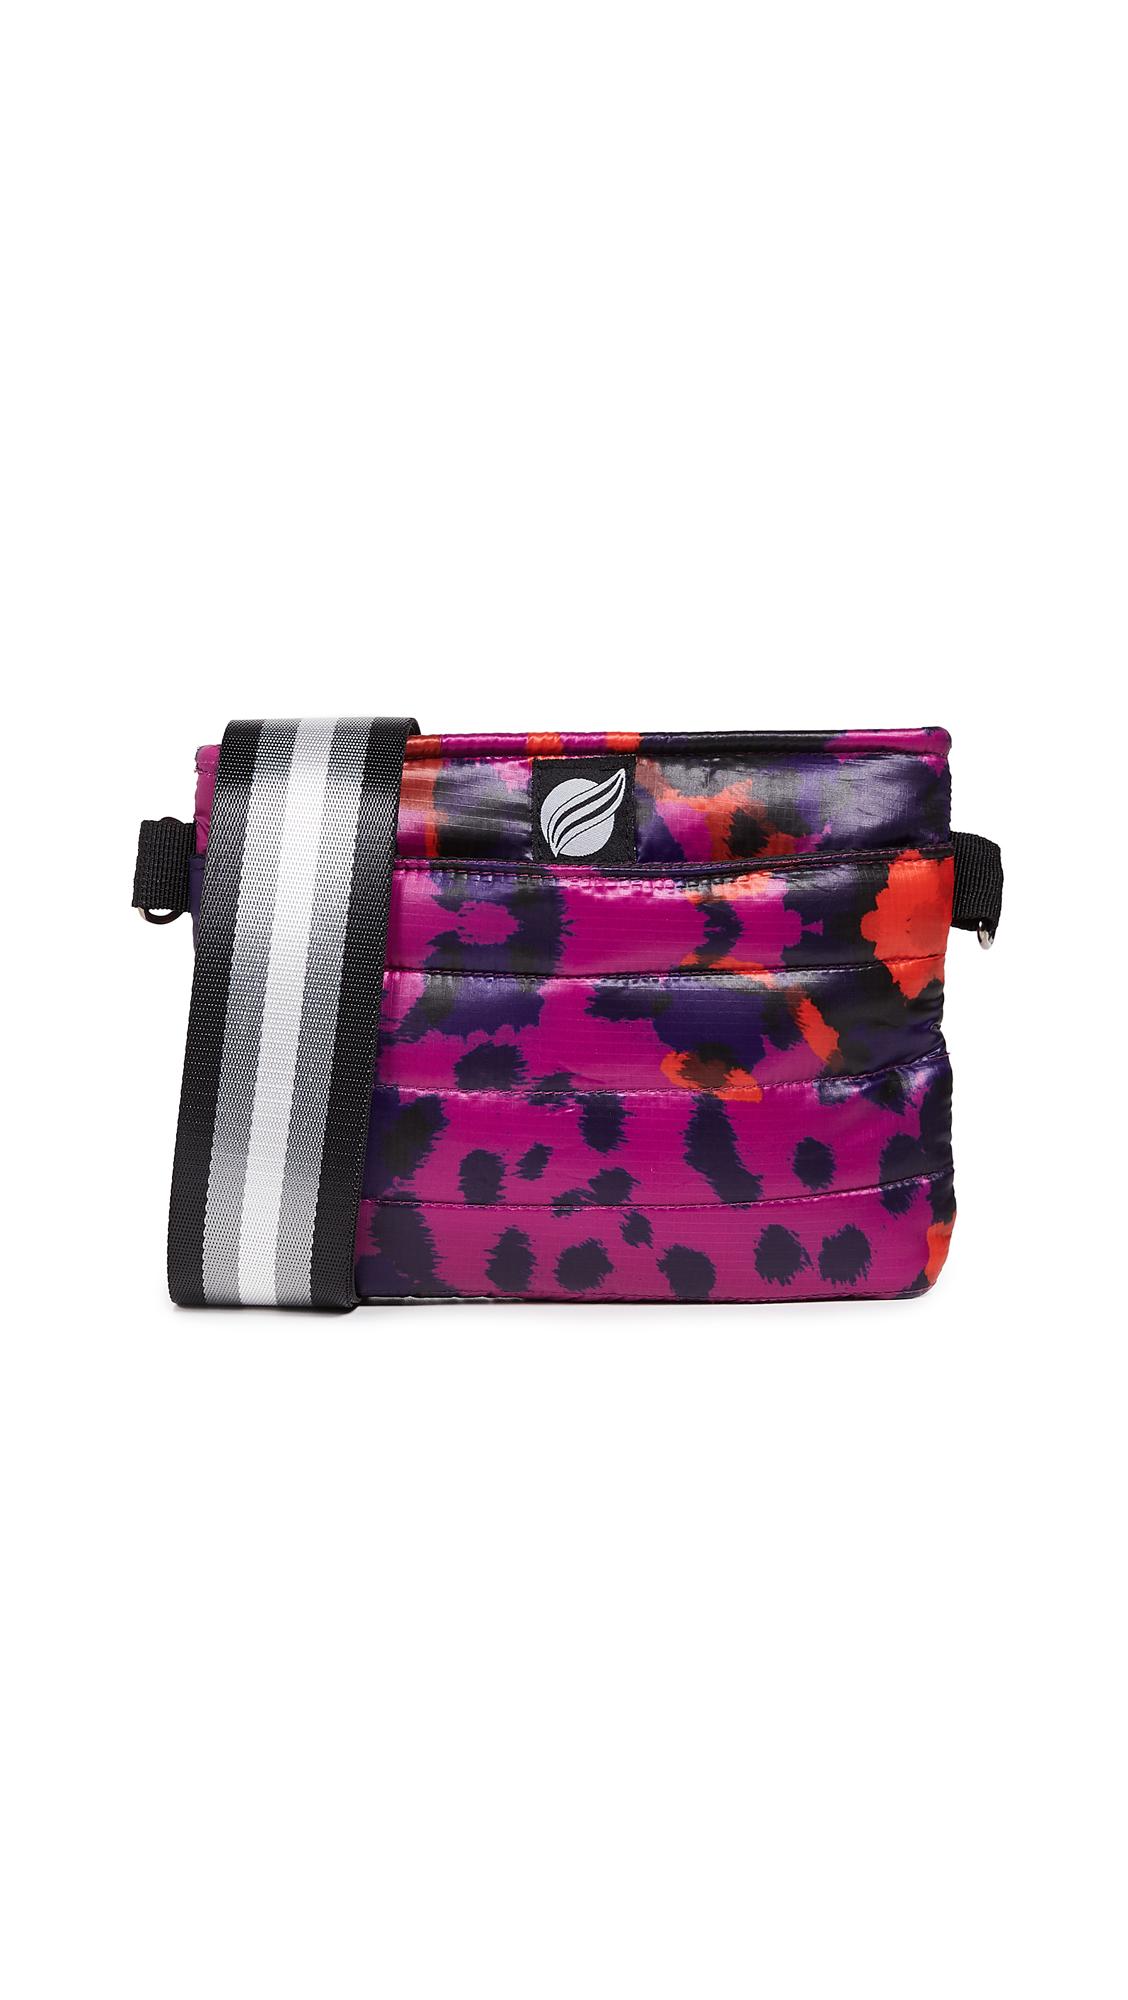 THINK ROYLN Convertible Belt Crossbody Bag in Urban Animal Fuchsia